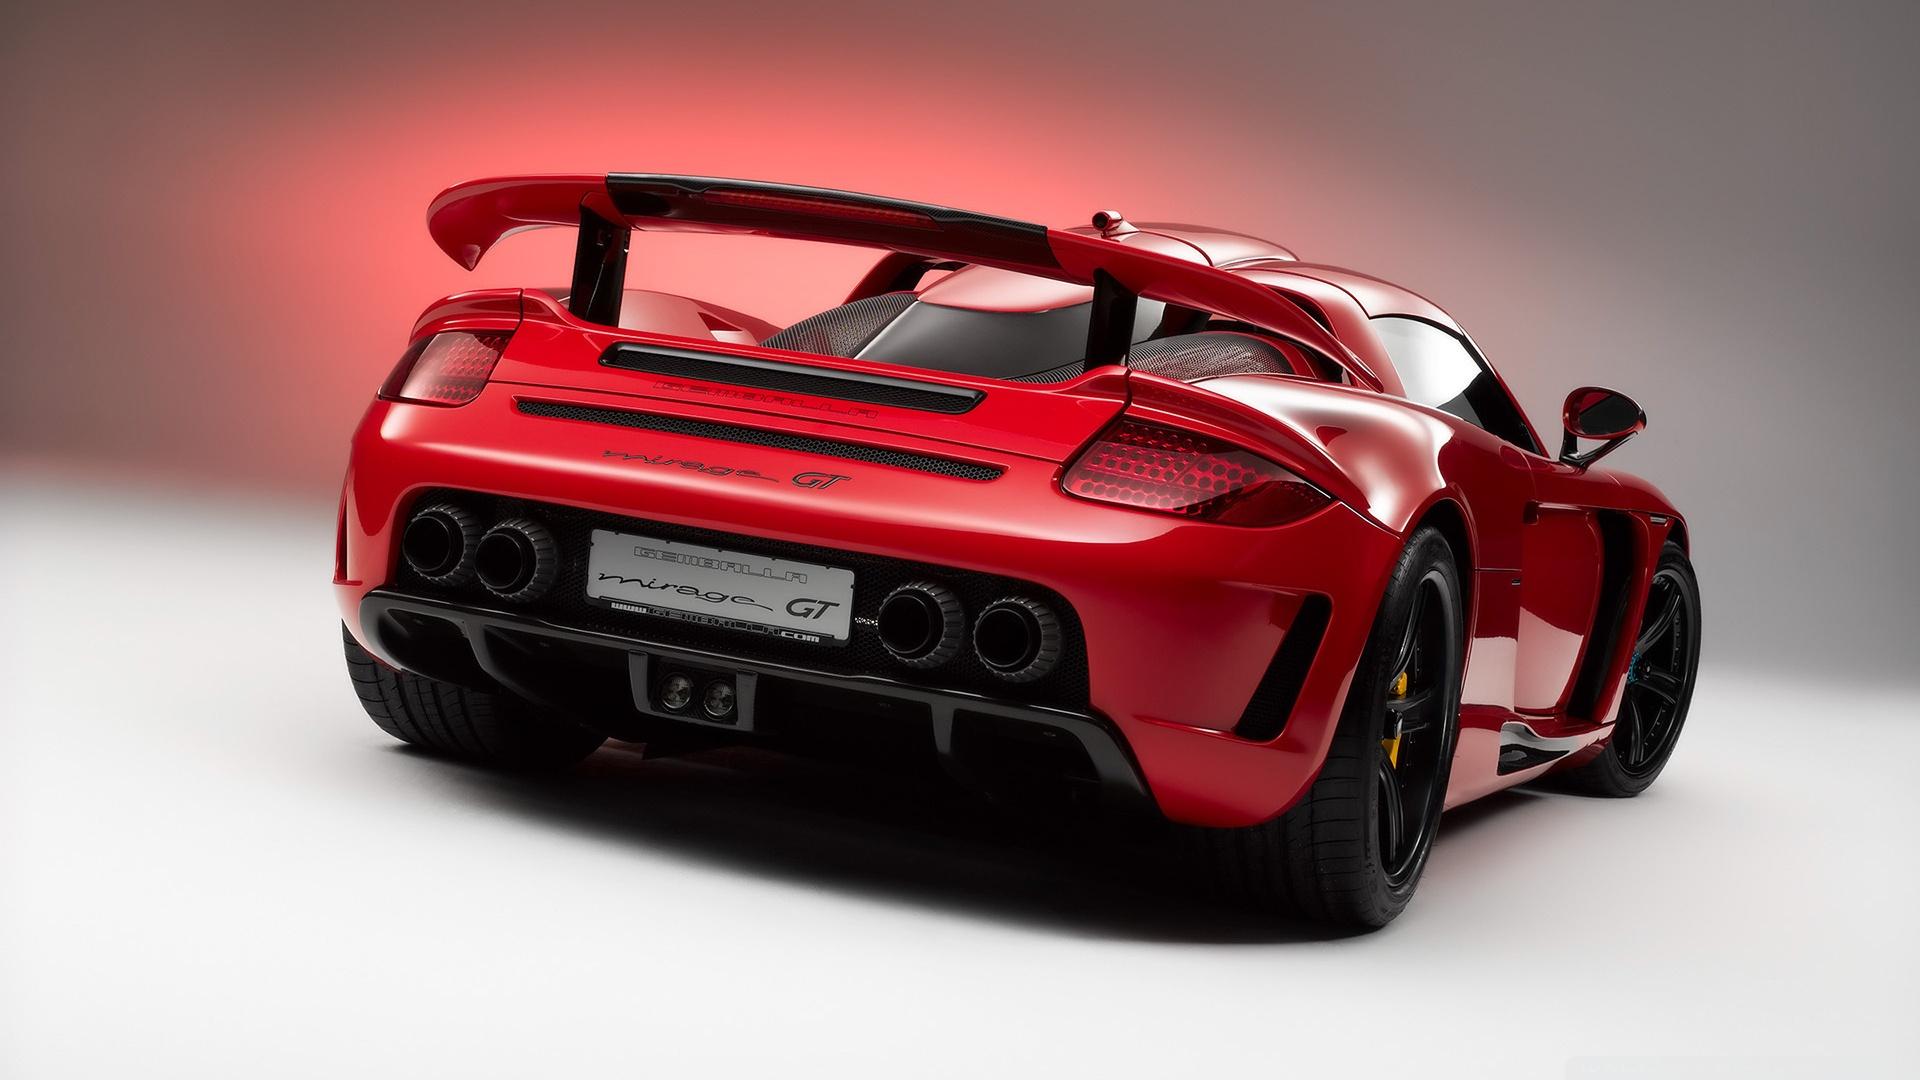 Download Free WallpaperRed Porsche Carrera